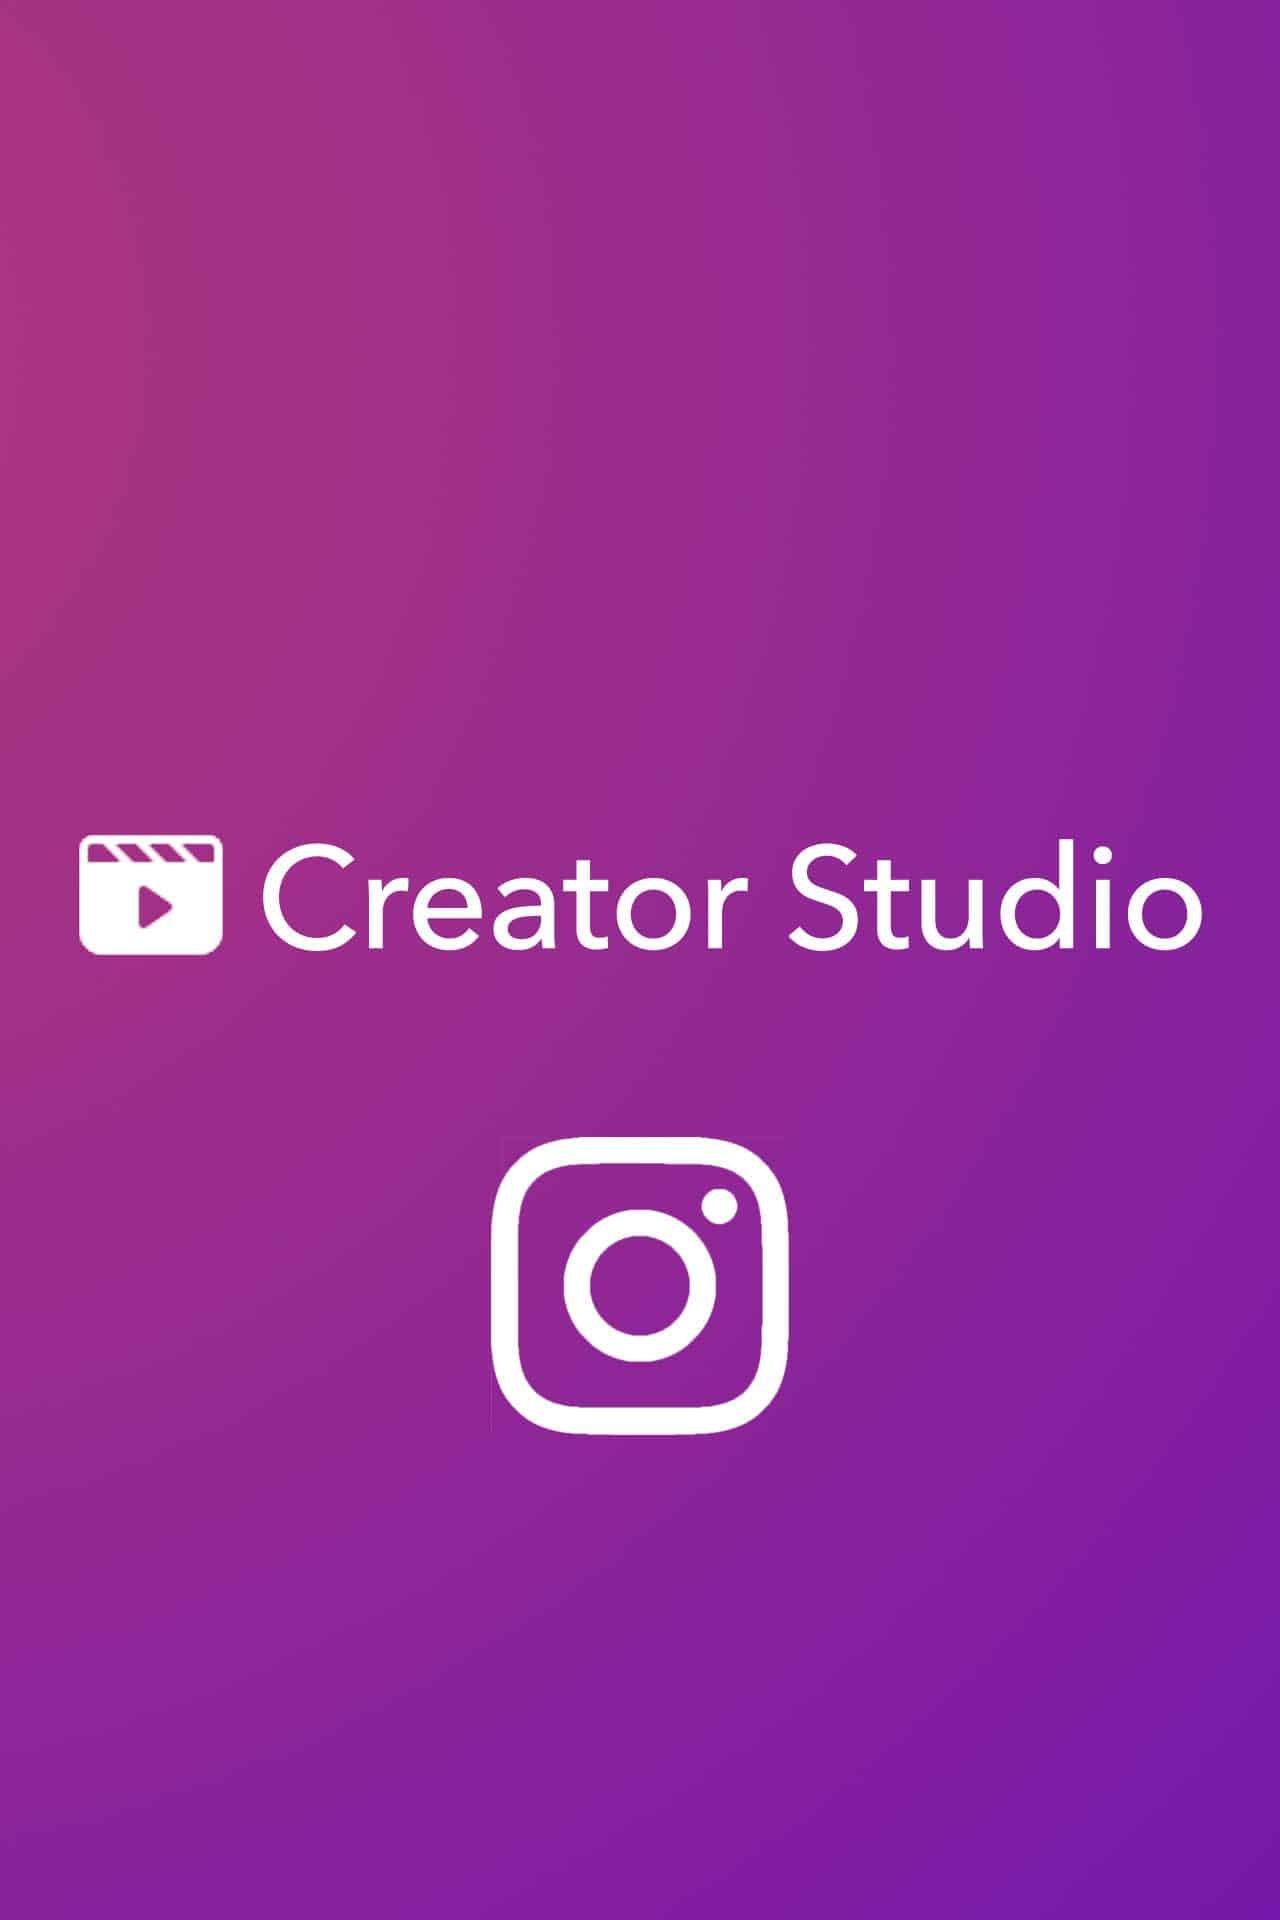 Creator Studio Instagram